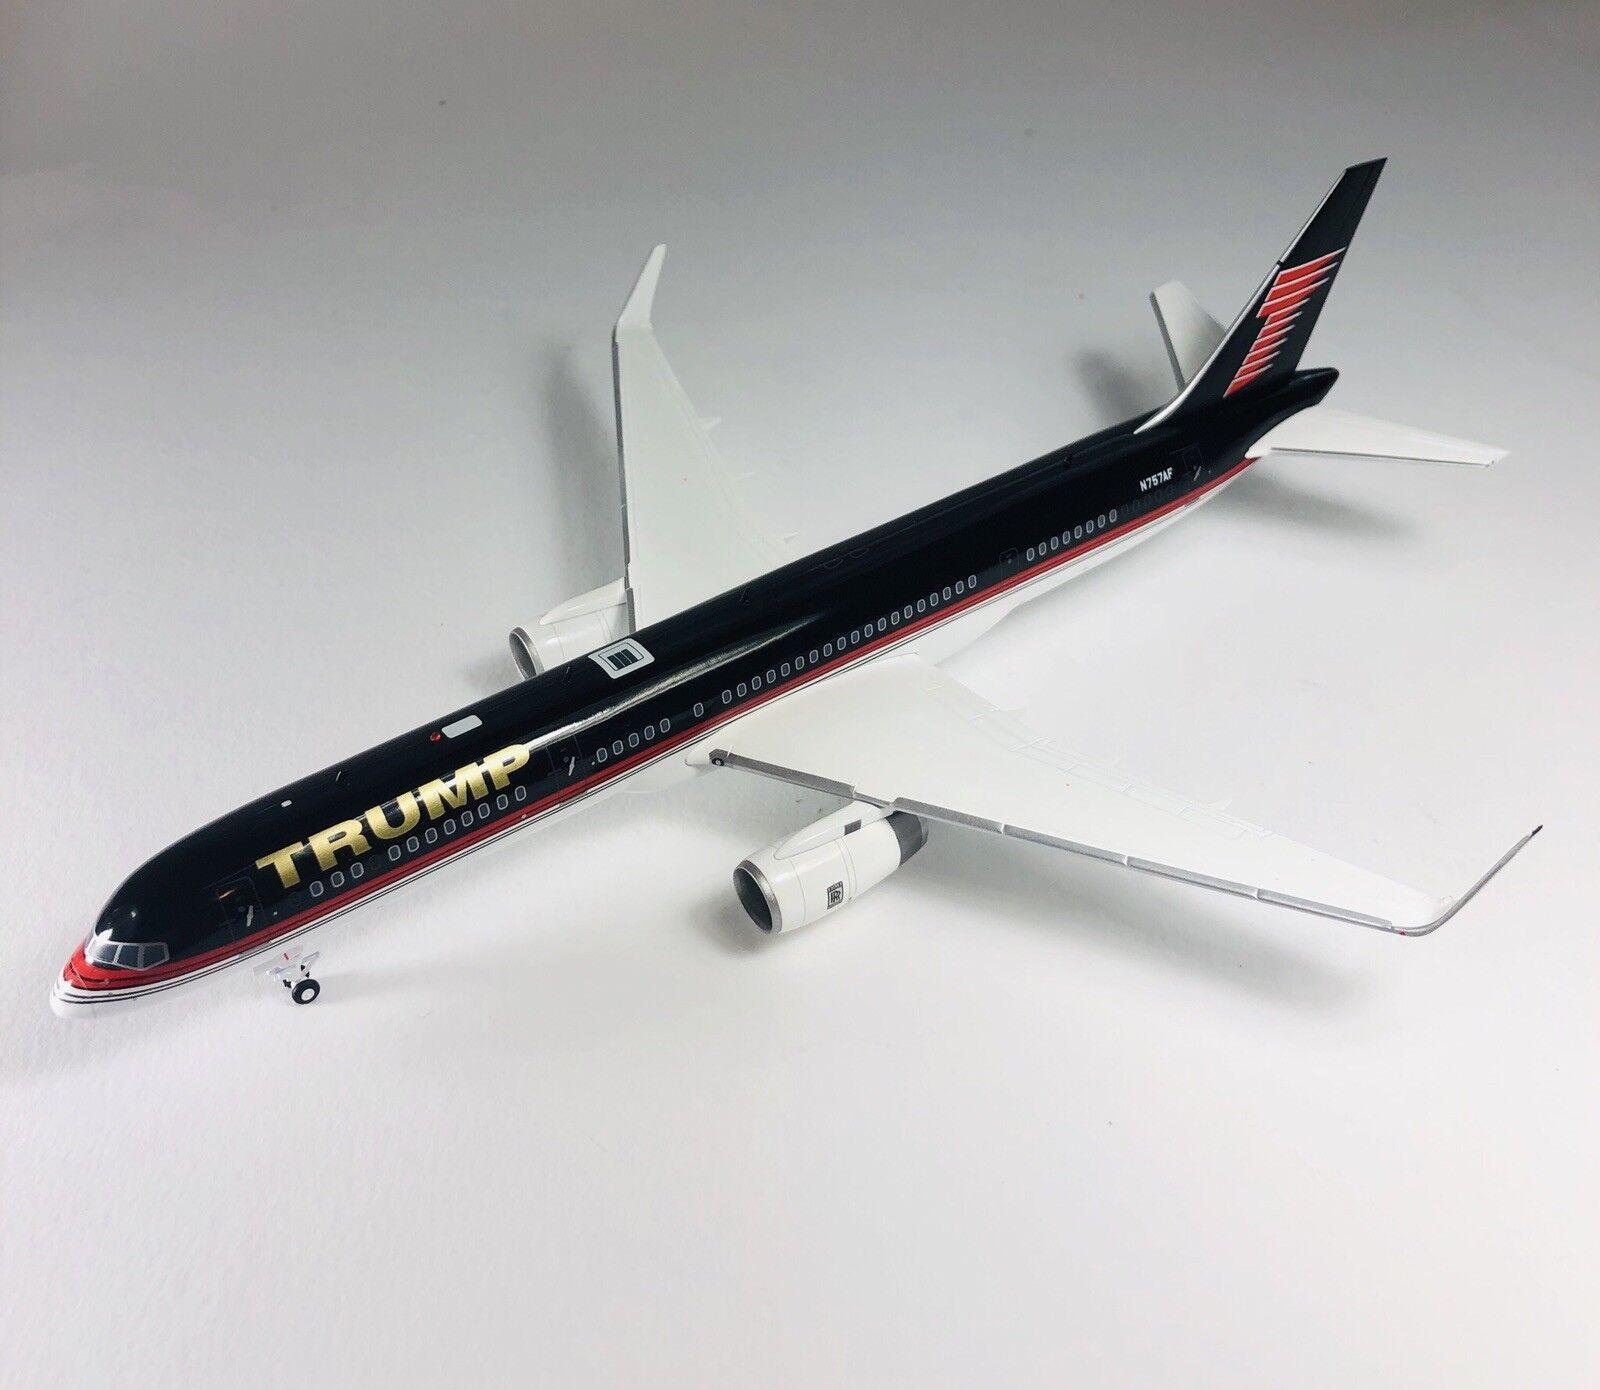 últimos estilos Gemini Jets 1 200 Trump B757-200 N757AF Modelo Diecast Diecast Diecast  los últimos modelos